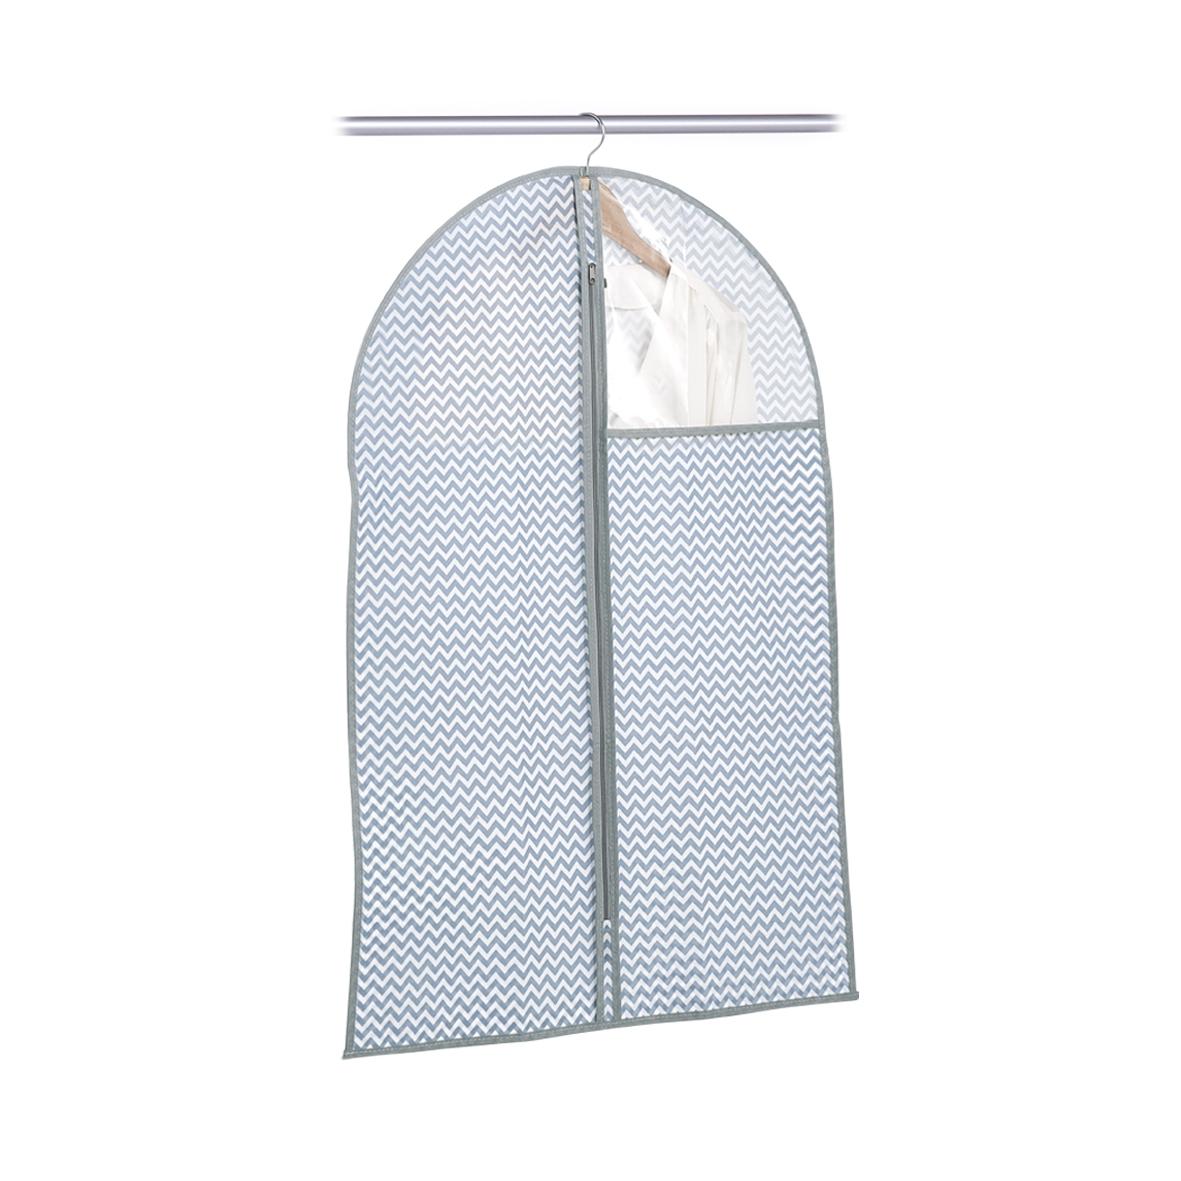 Husa textila pentru haine cu fermoar, Alb / Gri Zig Zag, l60xH90 cm imagine